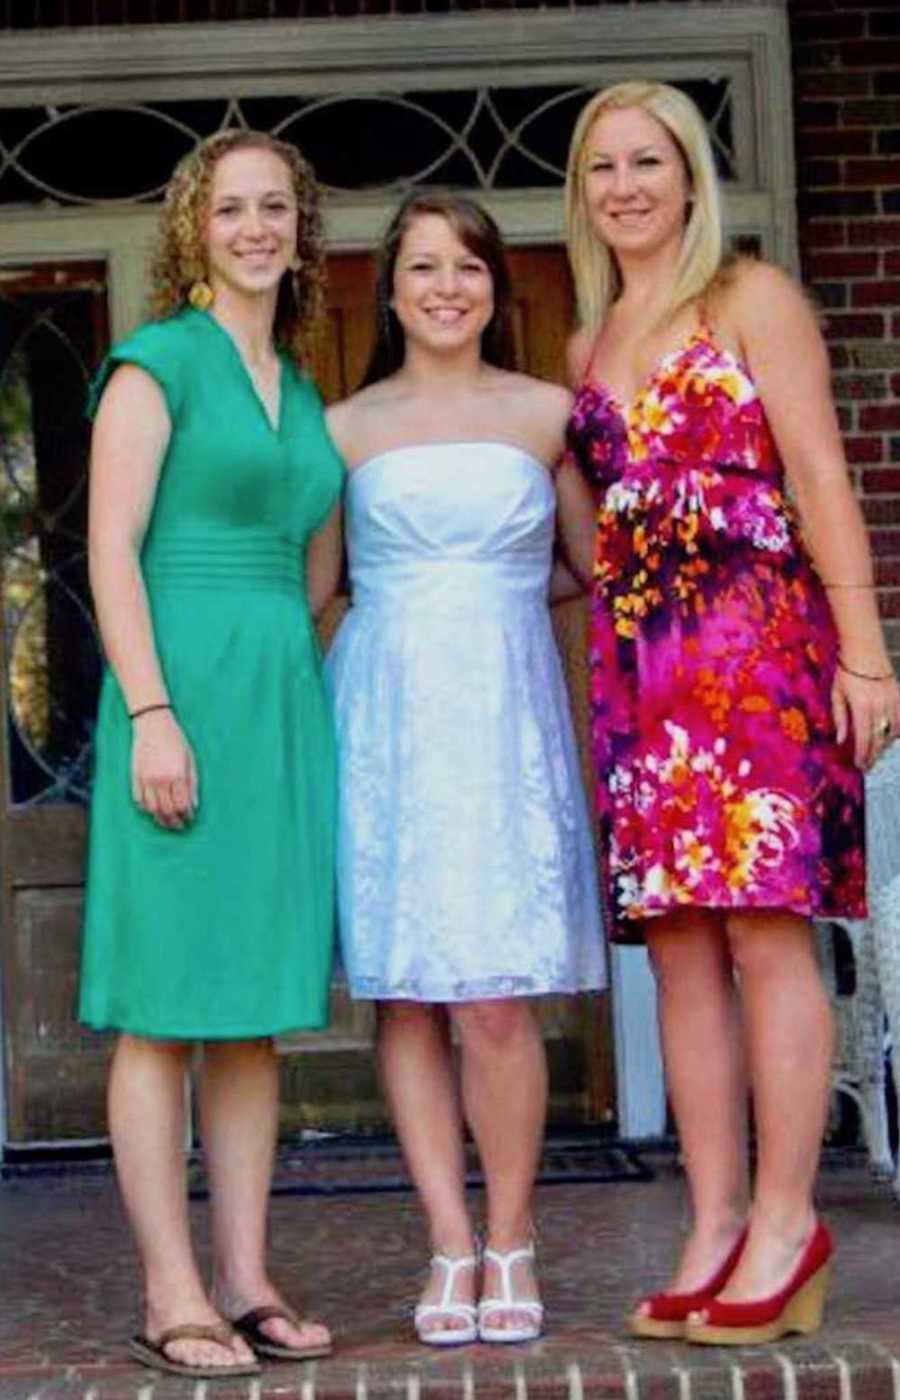 Three girls in dresses